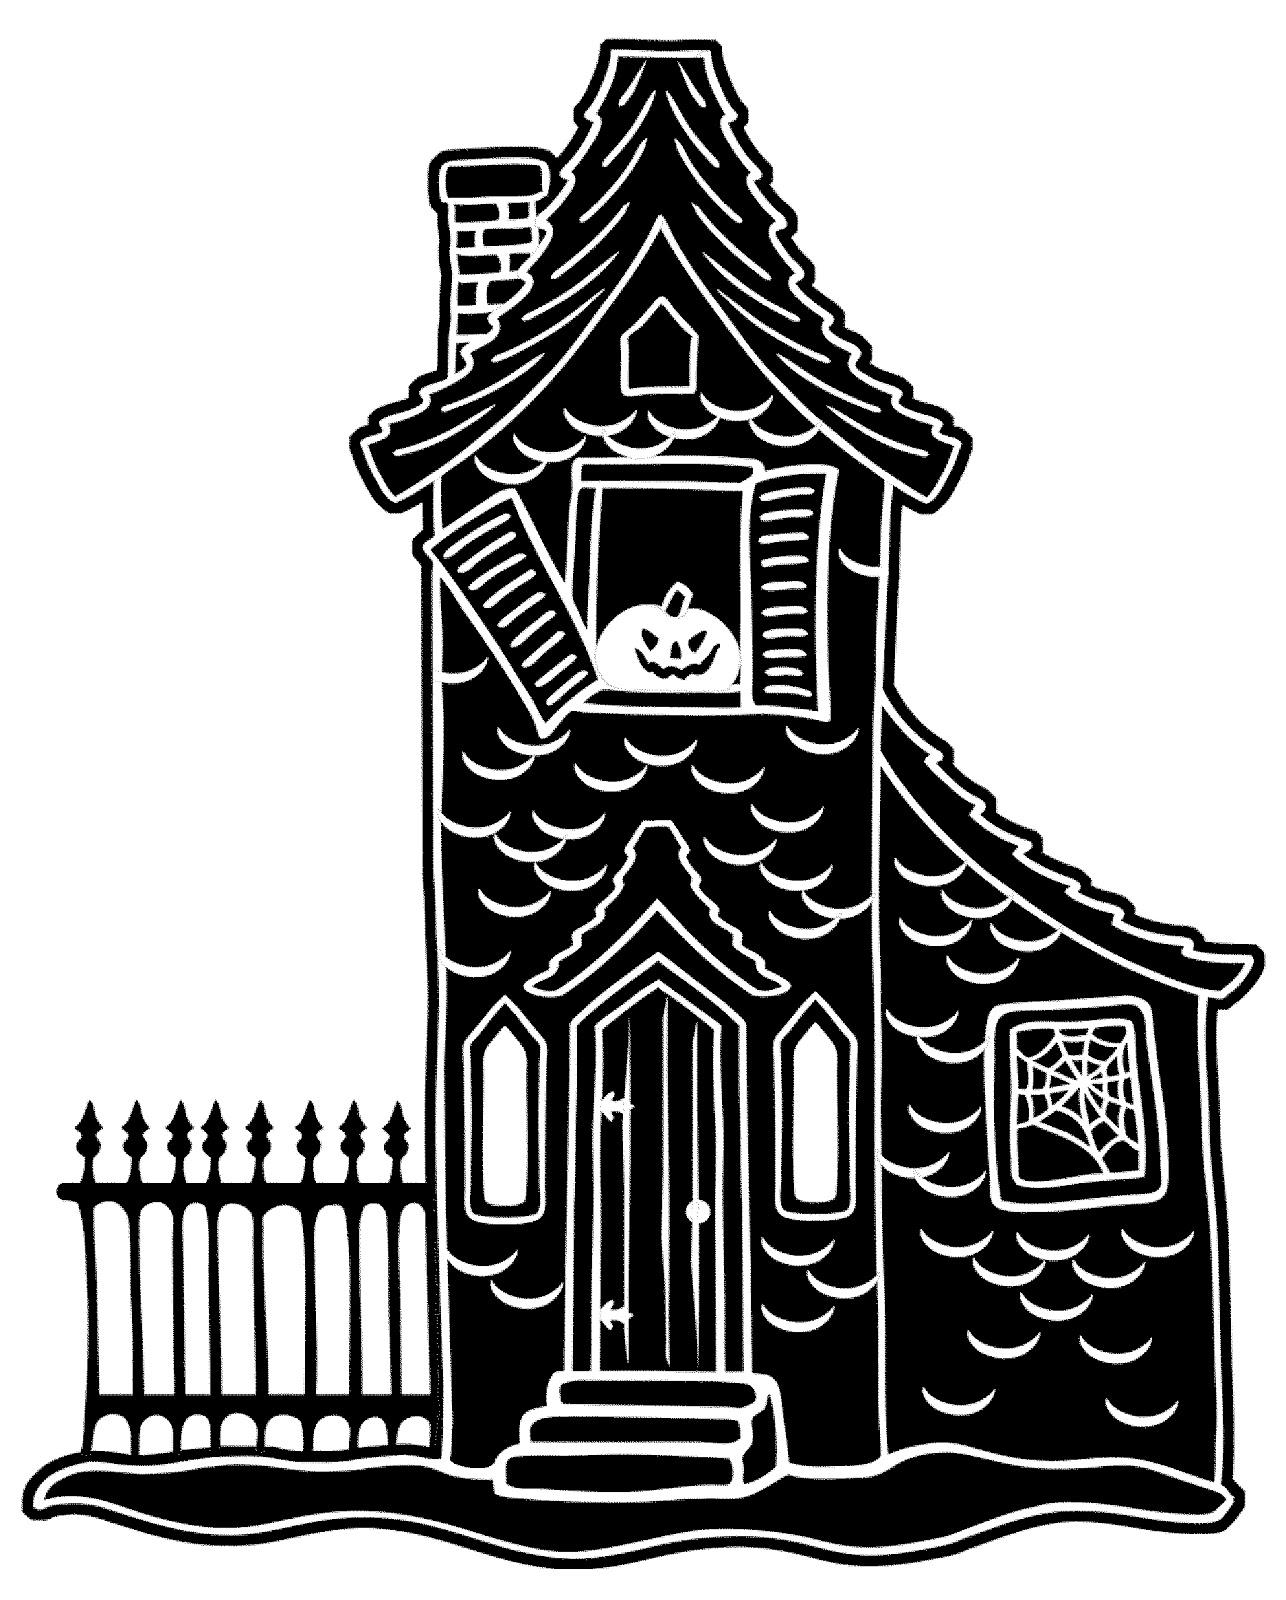 haunted house clip art black and white clipart panda free rh clipartpanda com Coloring Pictures of Haunted Houses Clip Art Coloring Pictures of Haunted Houses Clip Art